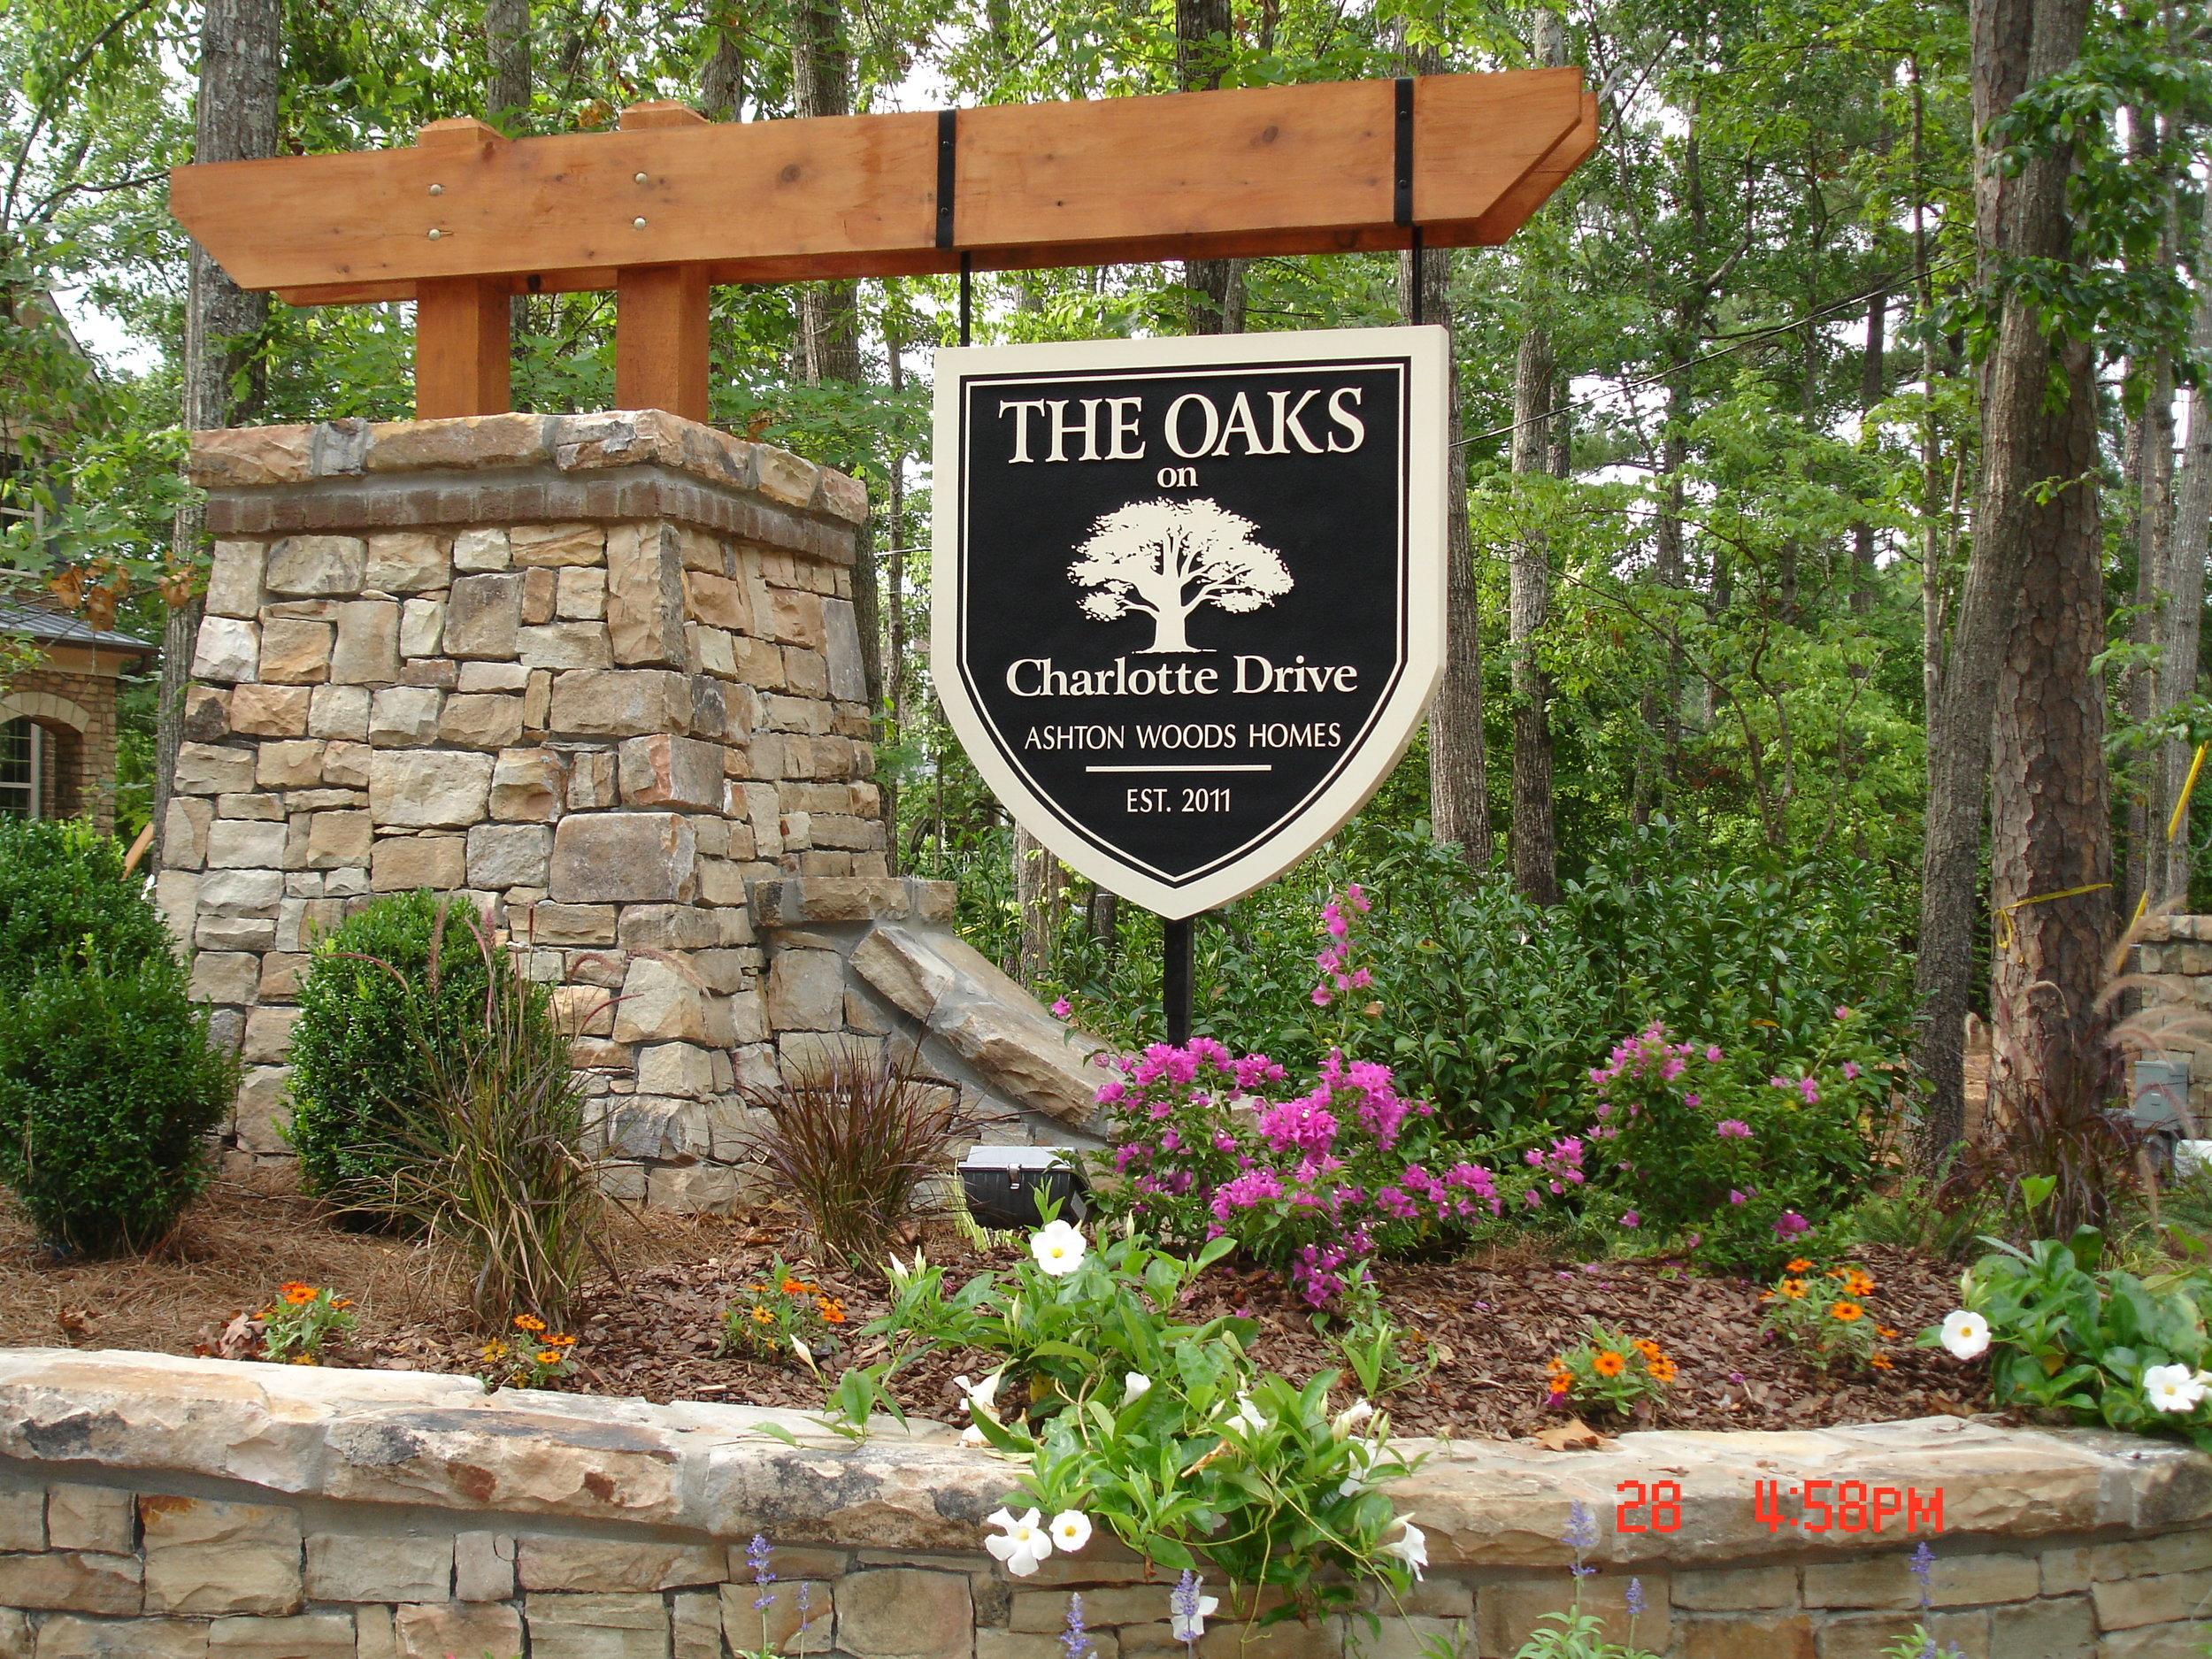 the oaks.JPG